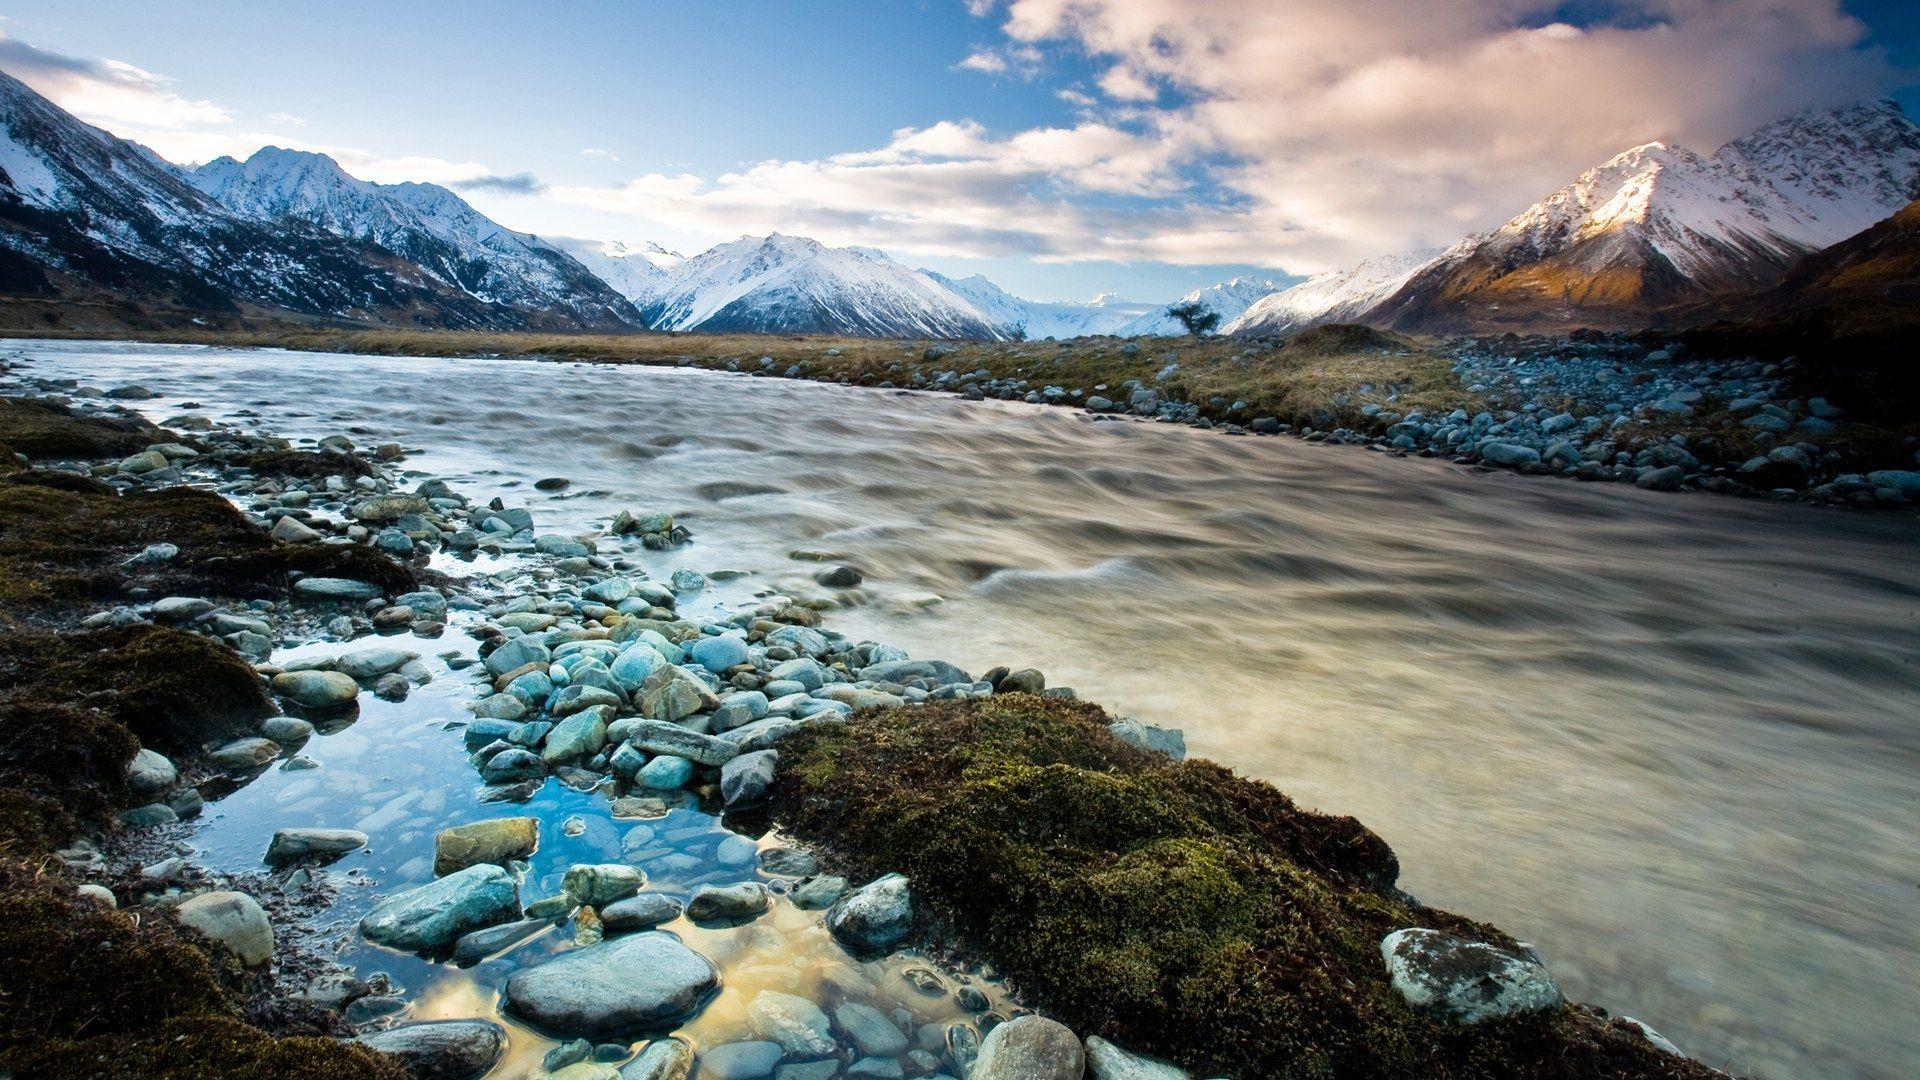 pin nature wallpaper landscape - photo #40